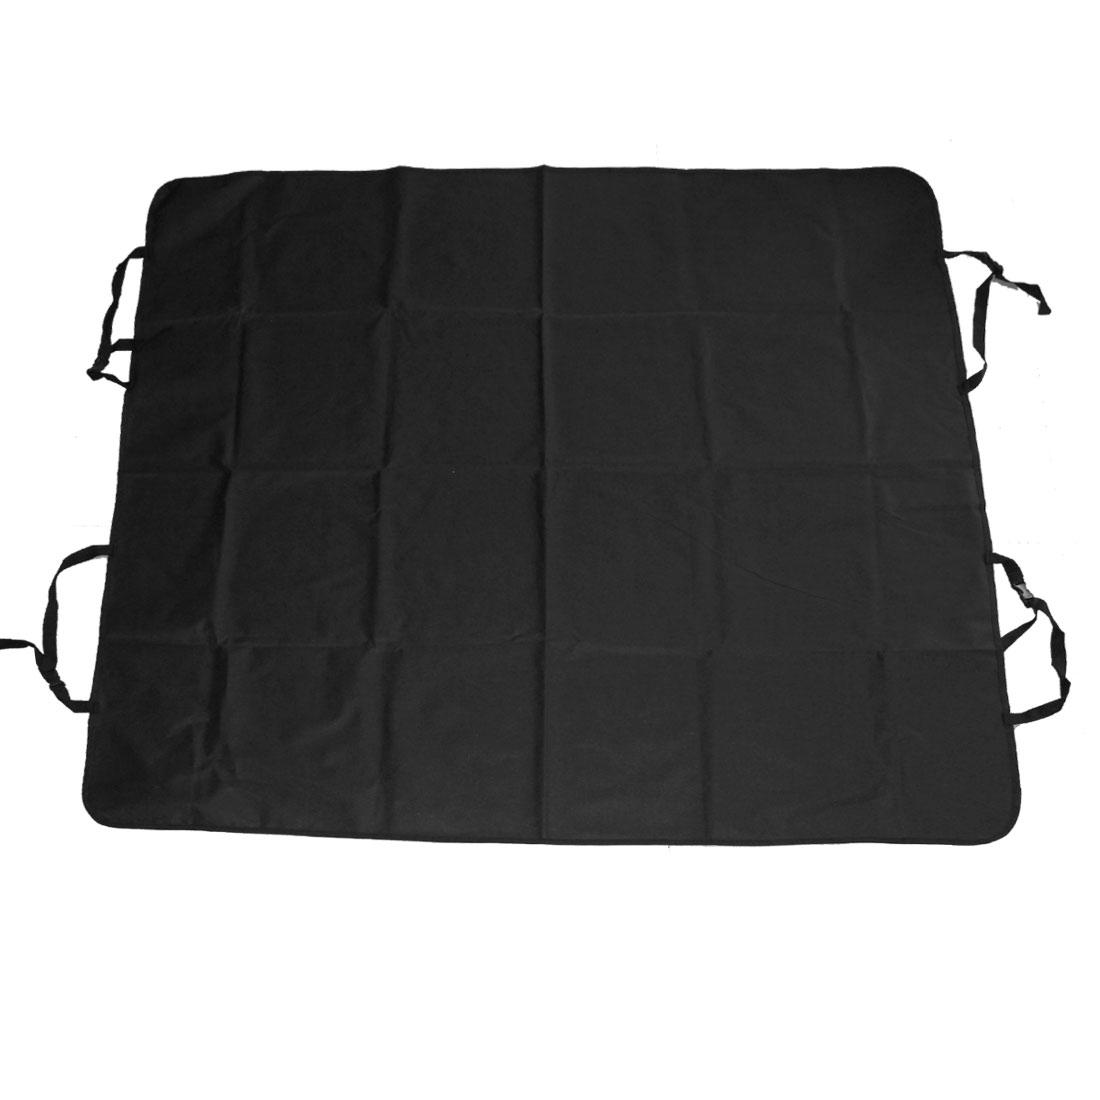 Dog Car Rear Back Seat Cover Pet Mat Blanket Hammock Cushion Black